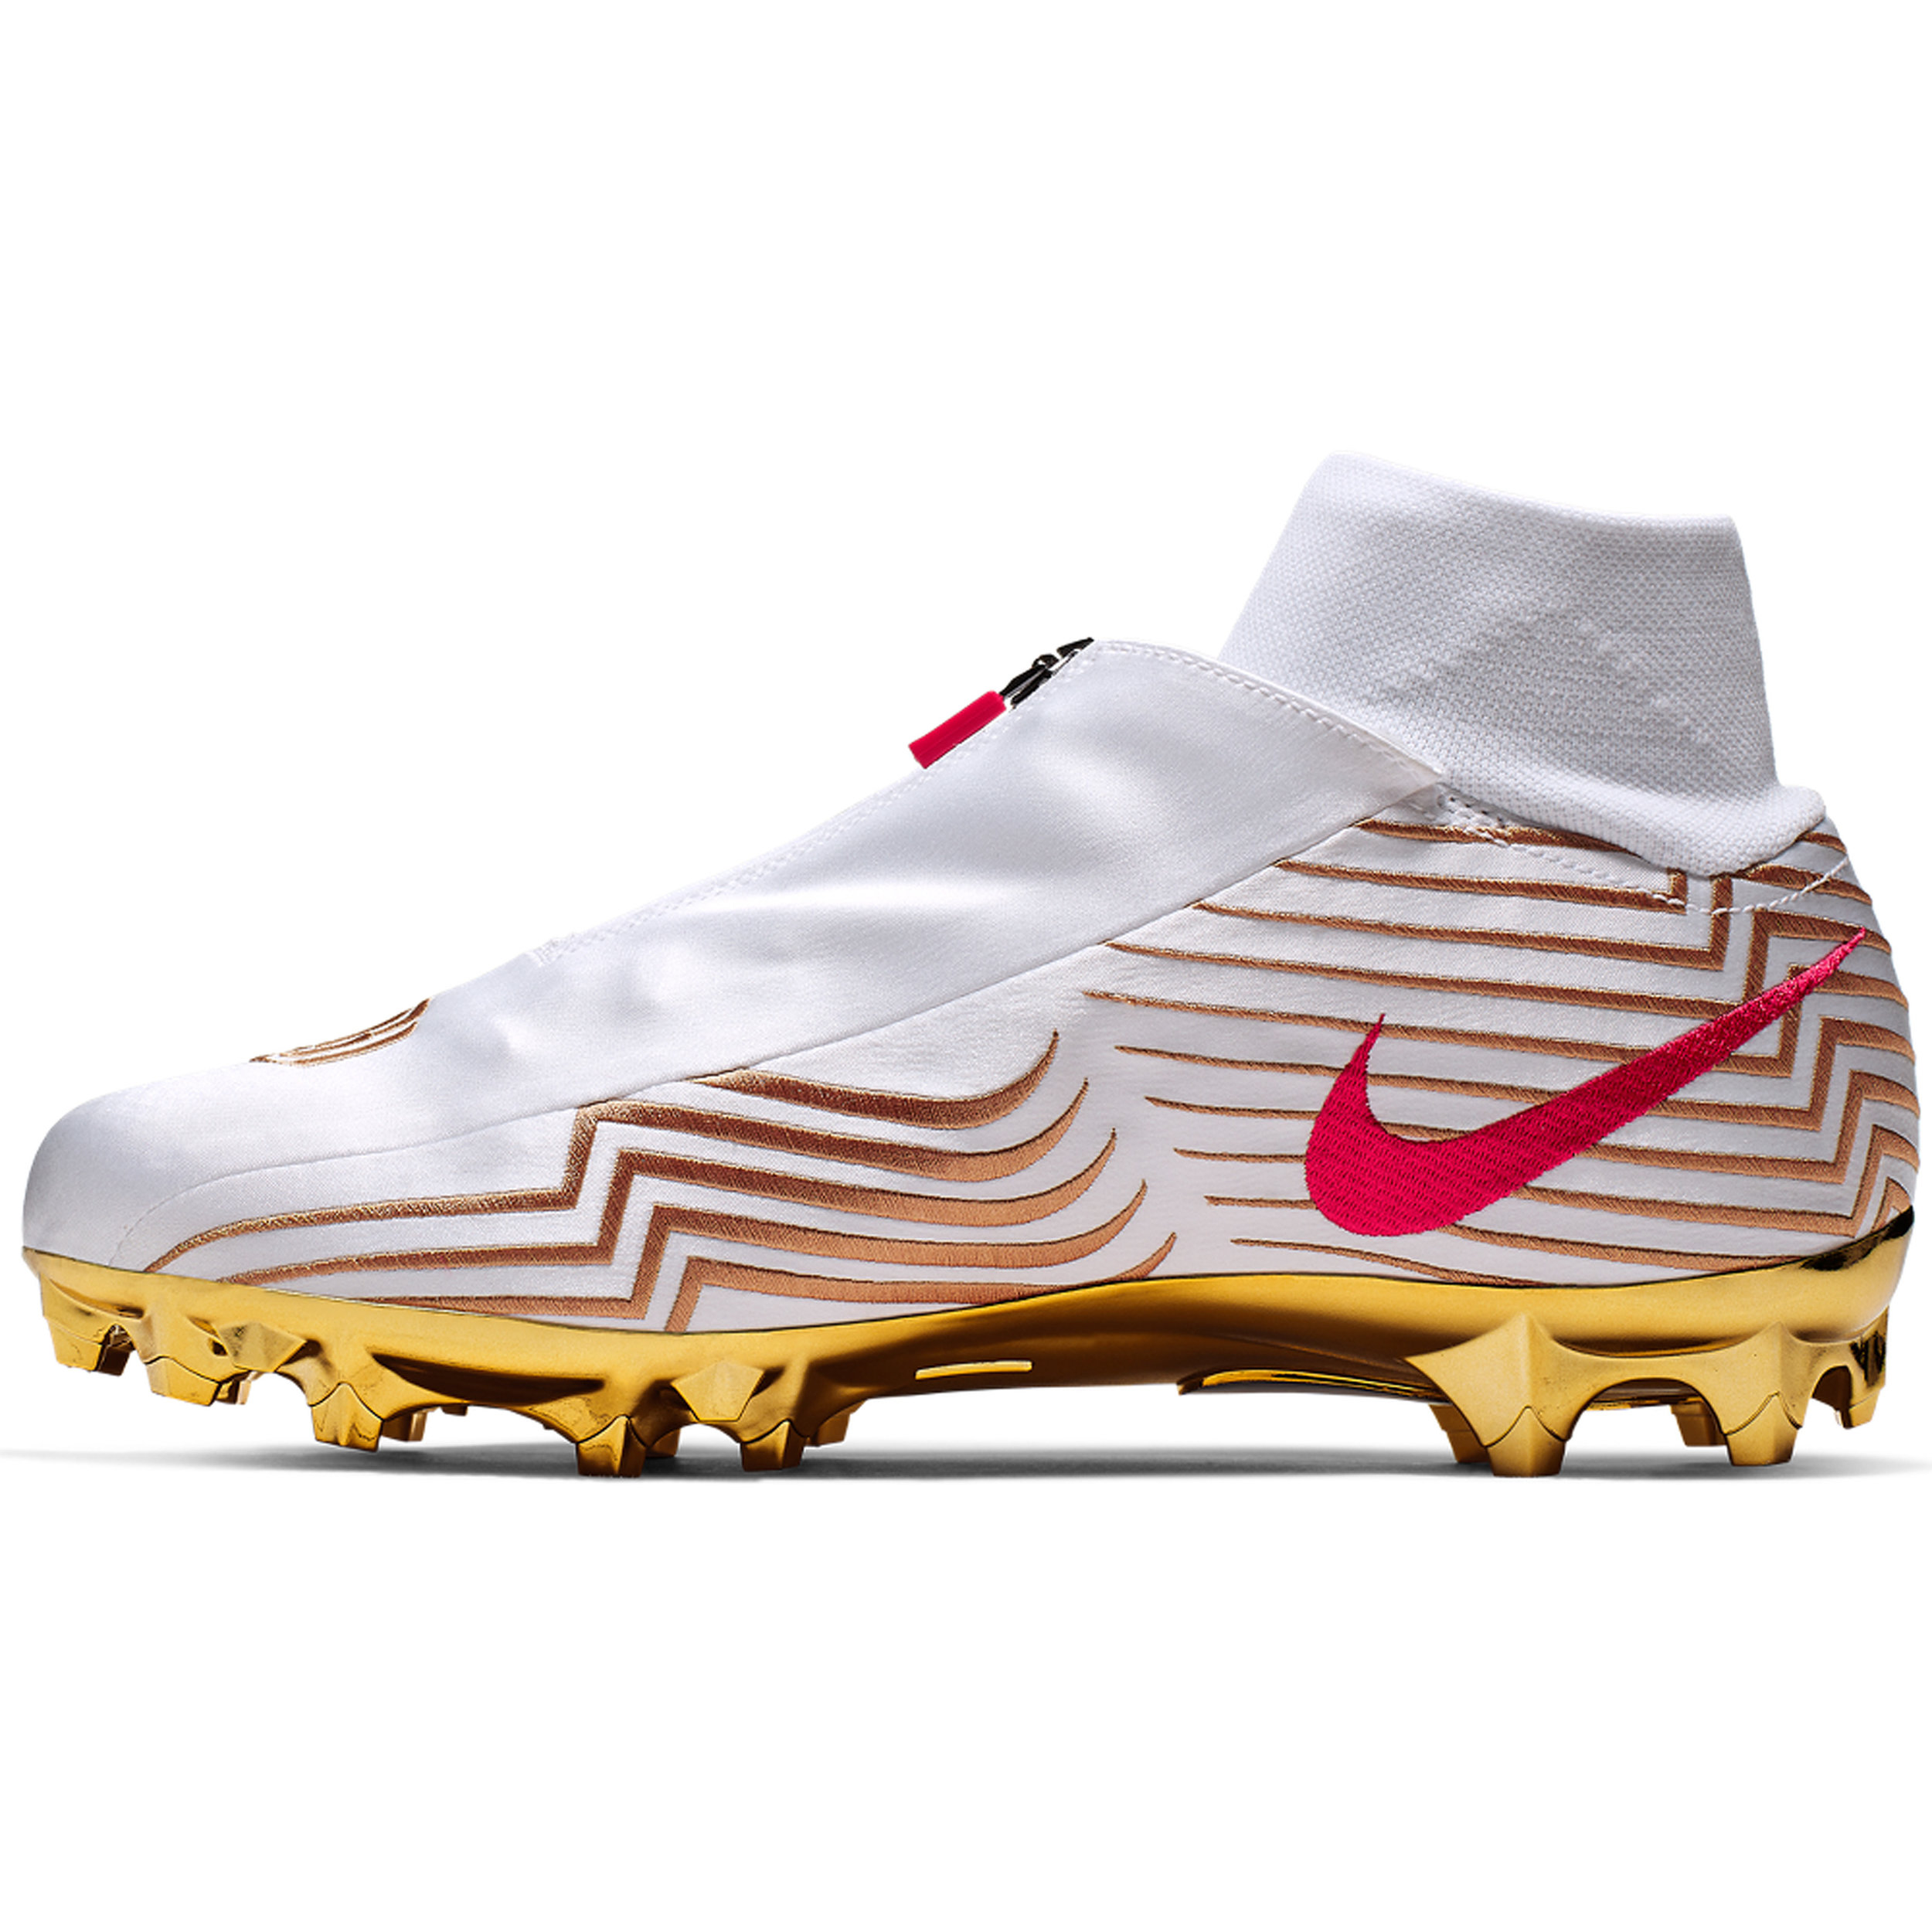 NikeNews_NikeVaporUntouchablePro3_OBJ_05_89286.jpg